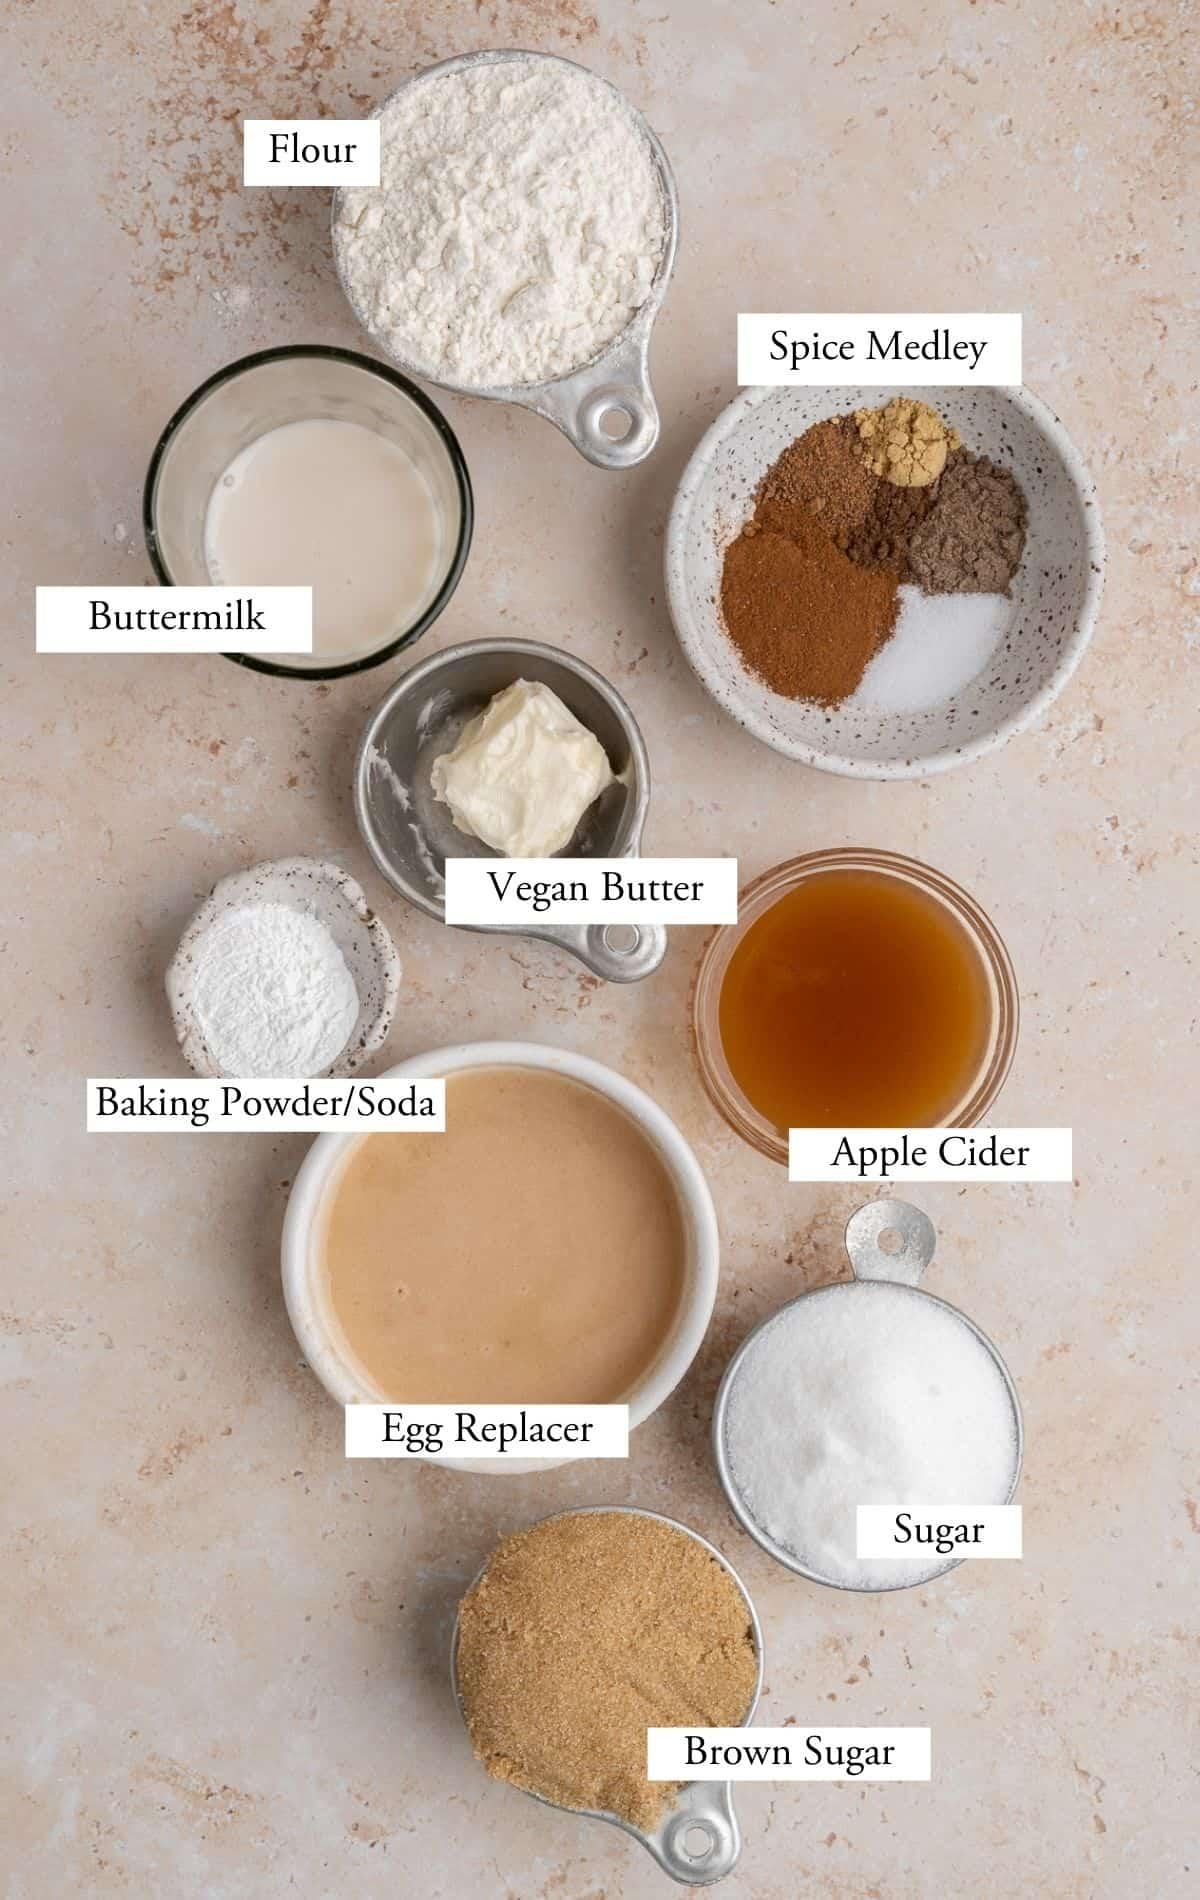 vegan apple cider donut ingredients: flour, apple cider, buttermilk, sugars, spices, baking powder & soda, egg replacer.